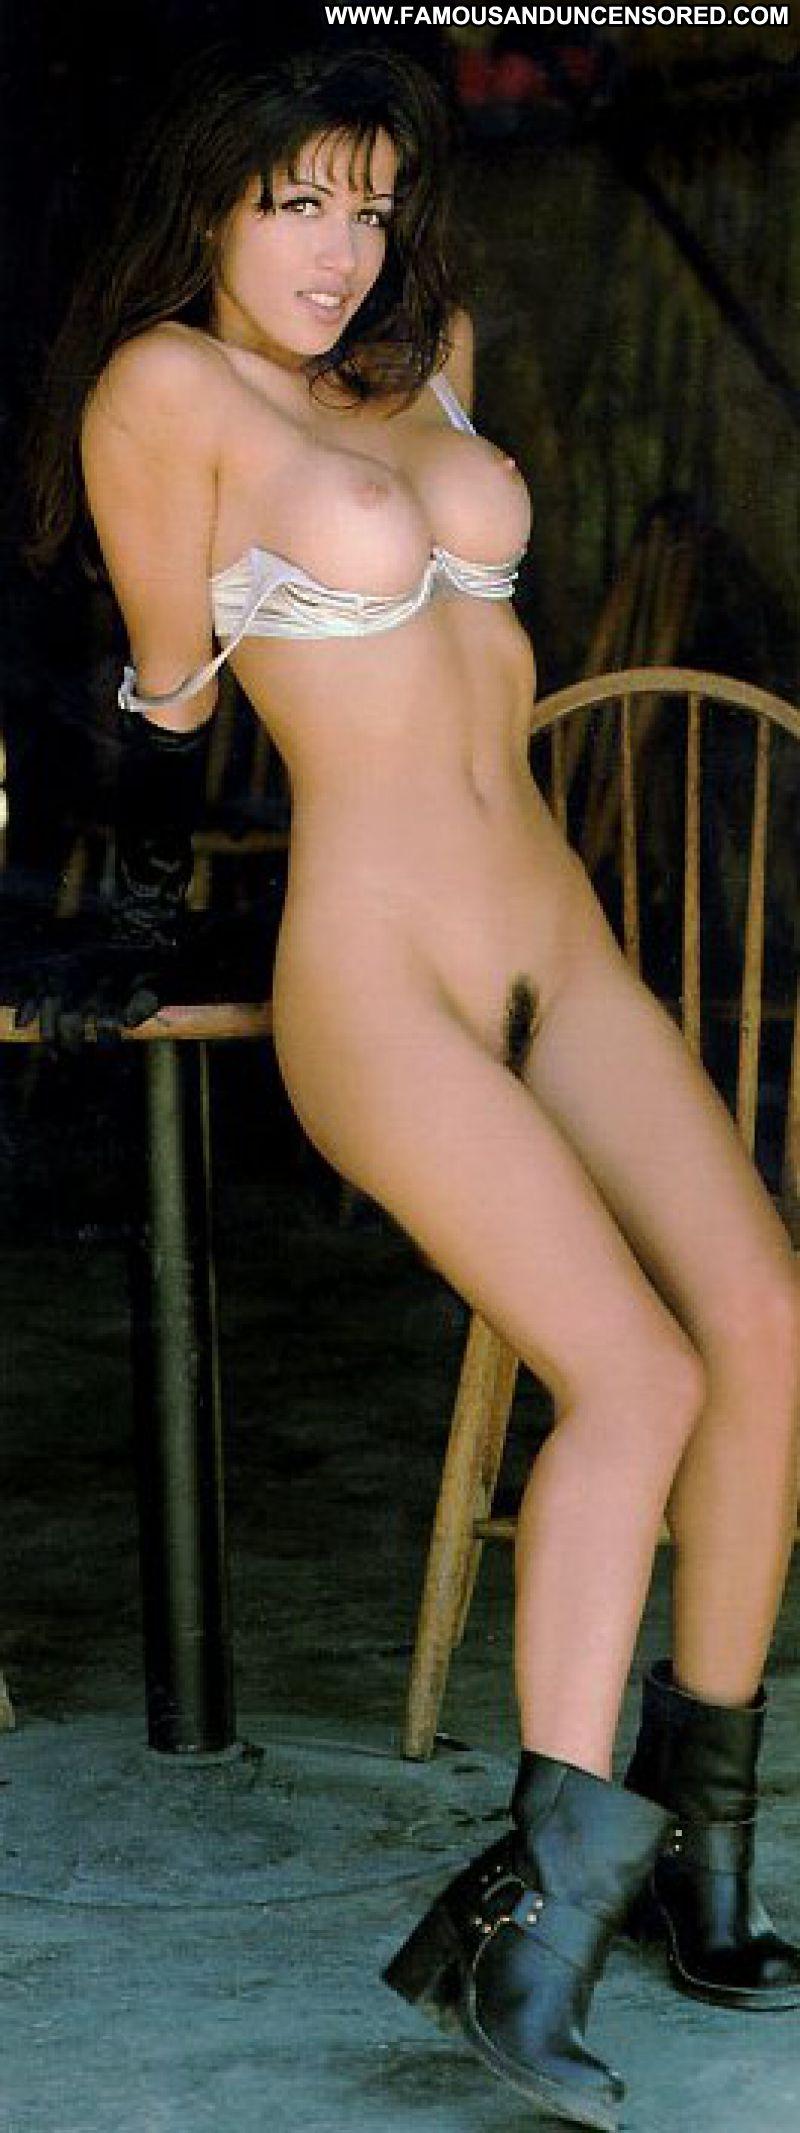 Sex photo Huge titty midget porn